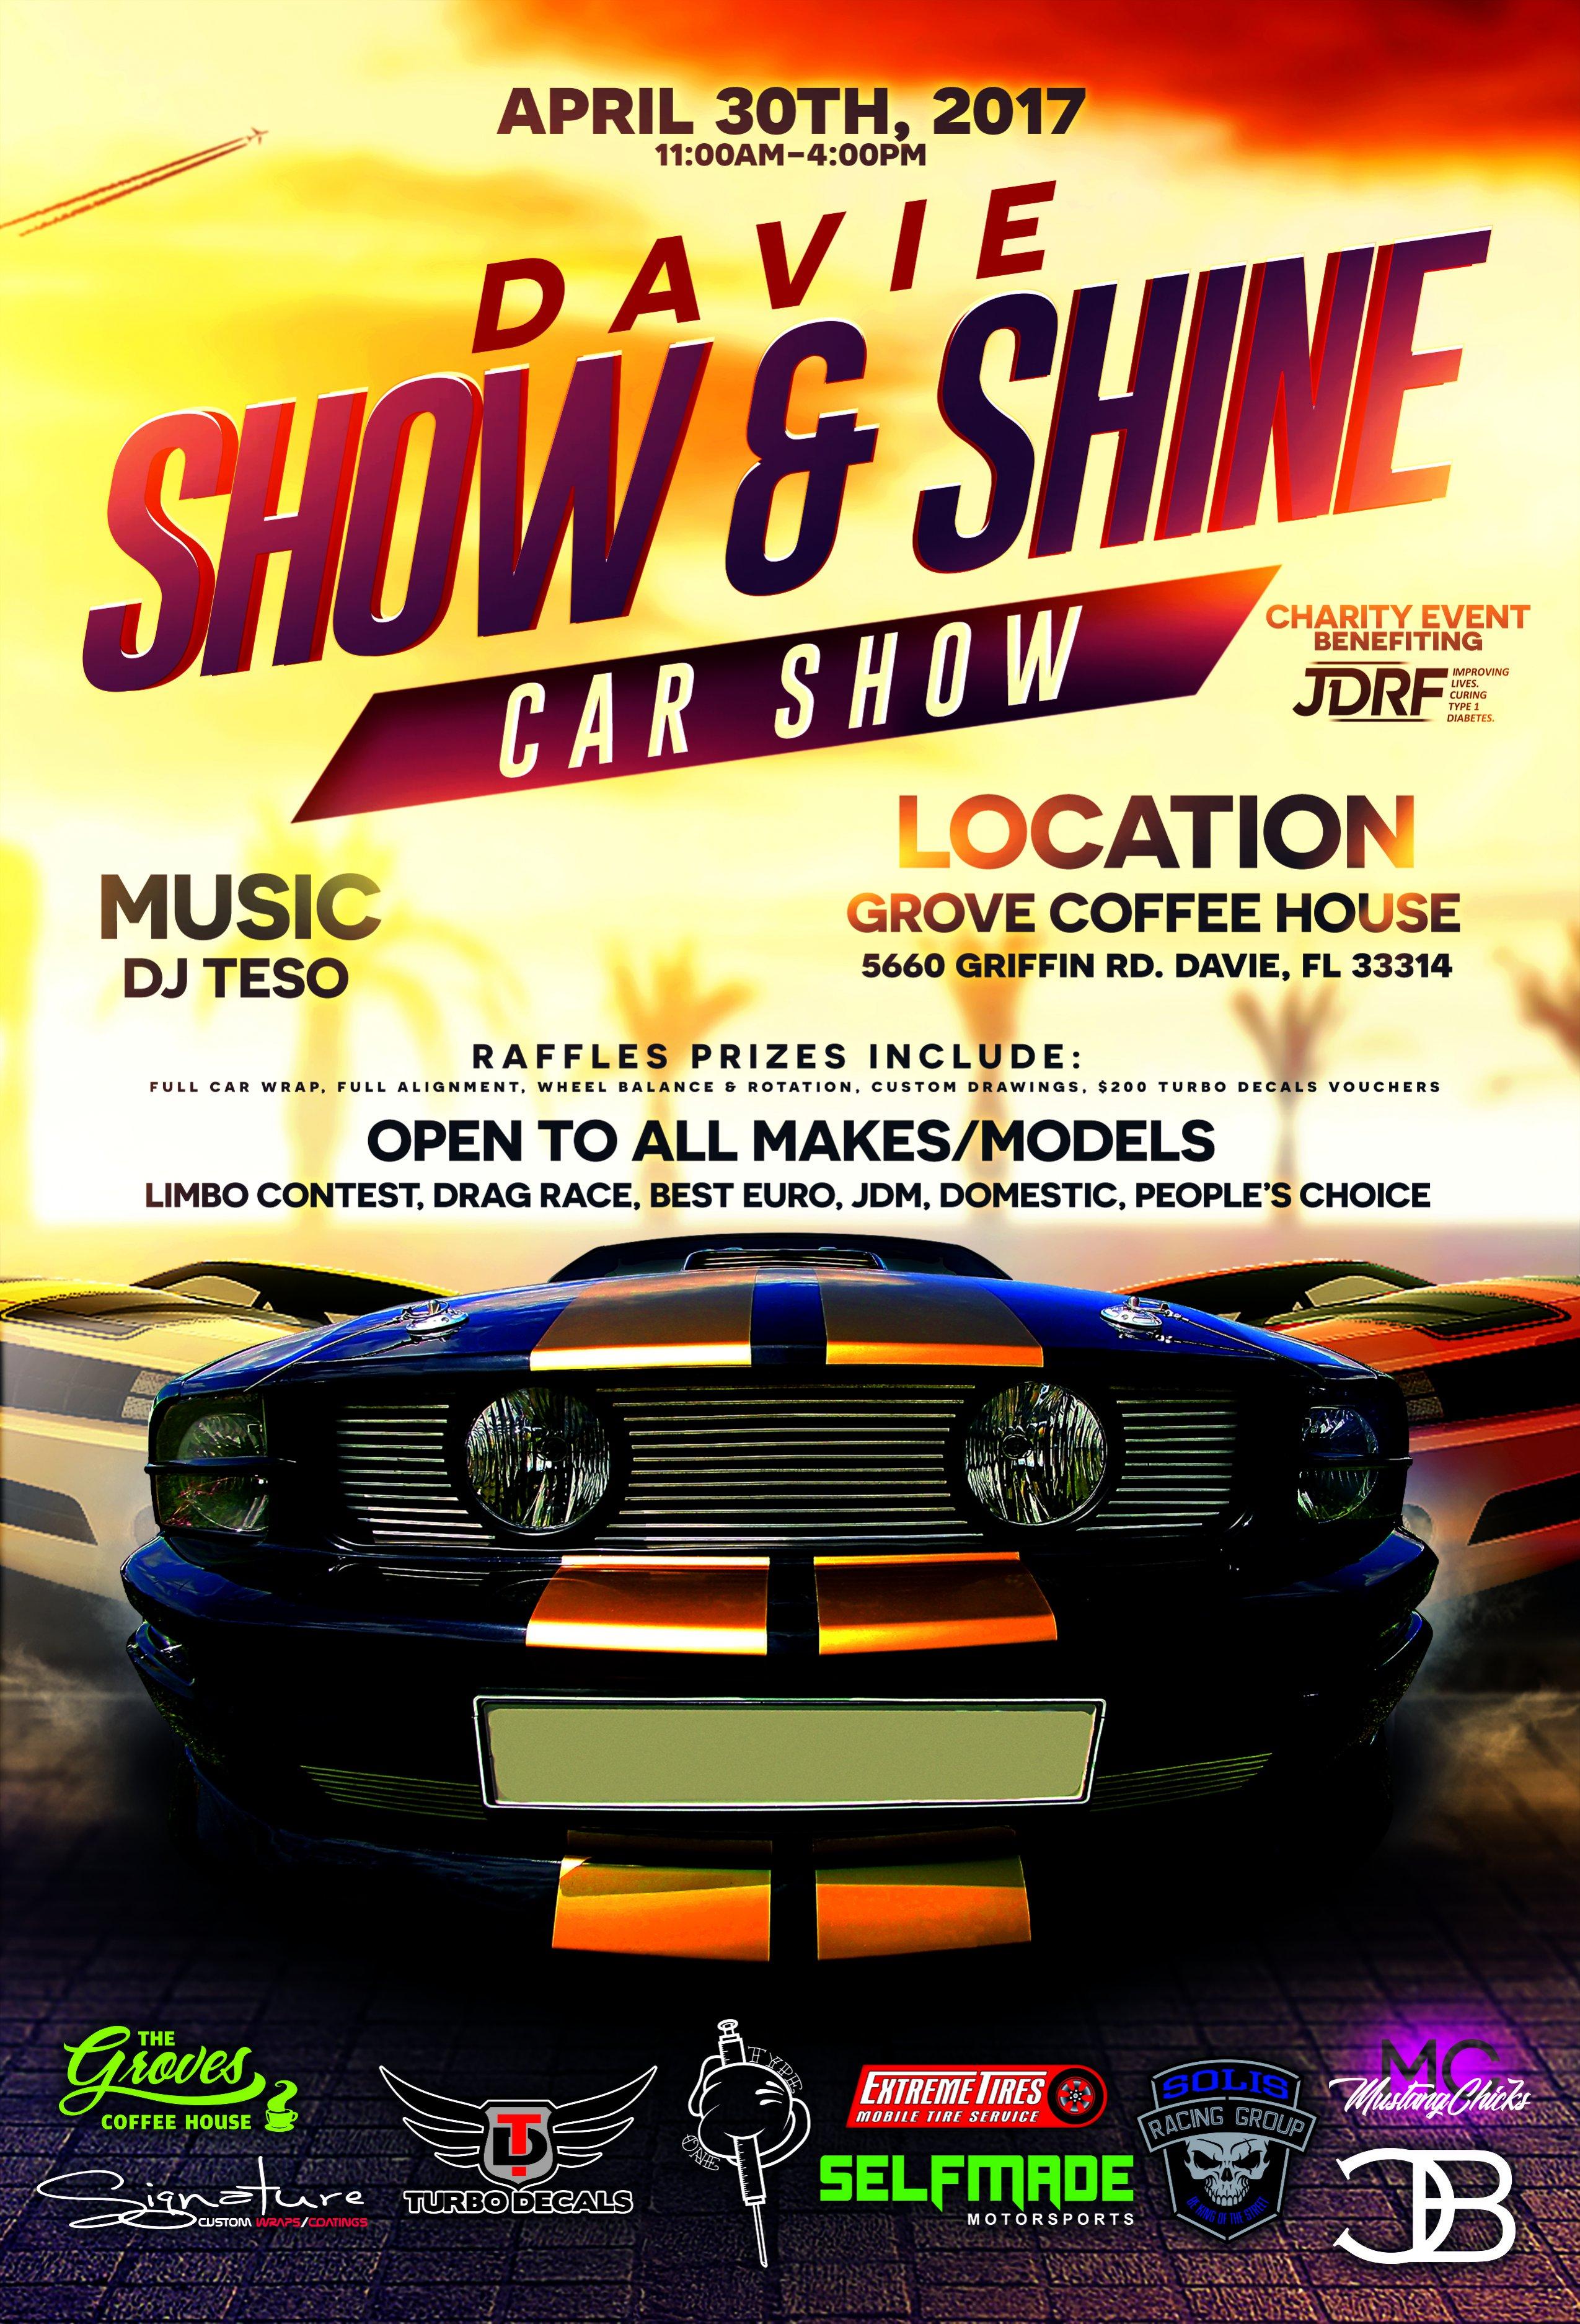 Click image for larger version  Name:Davie Show & Shine Car Show %28PRINT%29_2 (1).jpg Views:31 Size:1.14 MB ID:222529